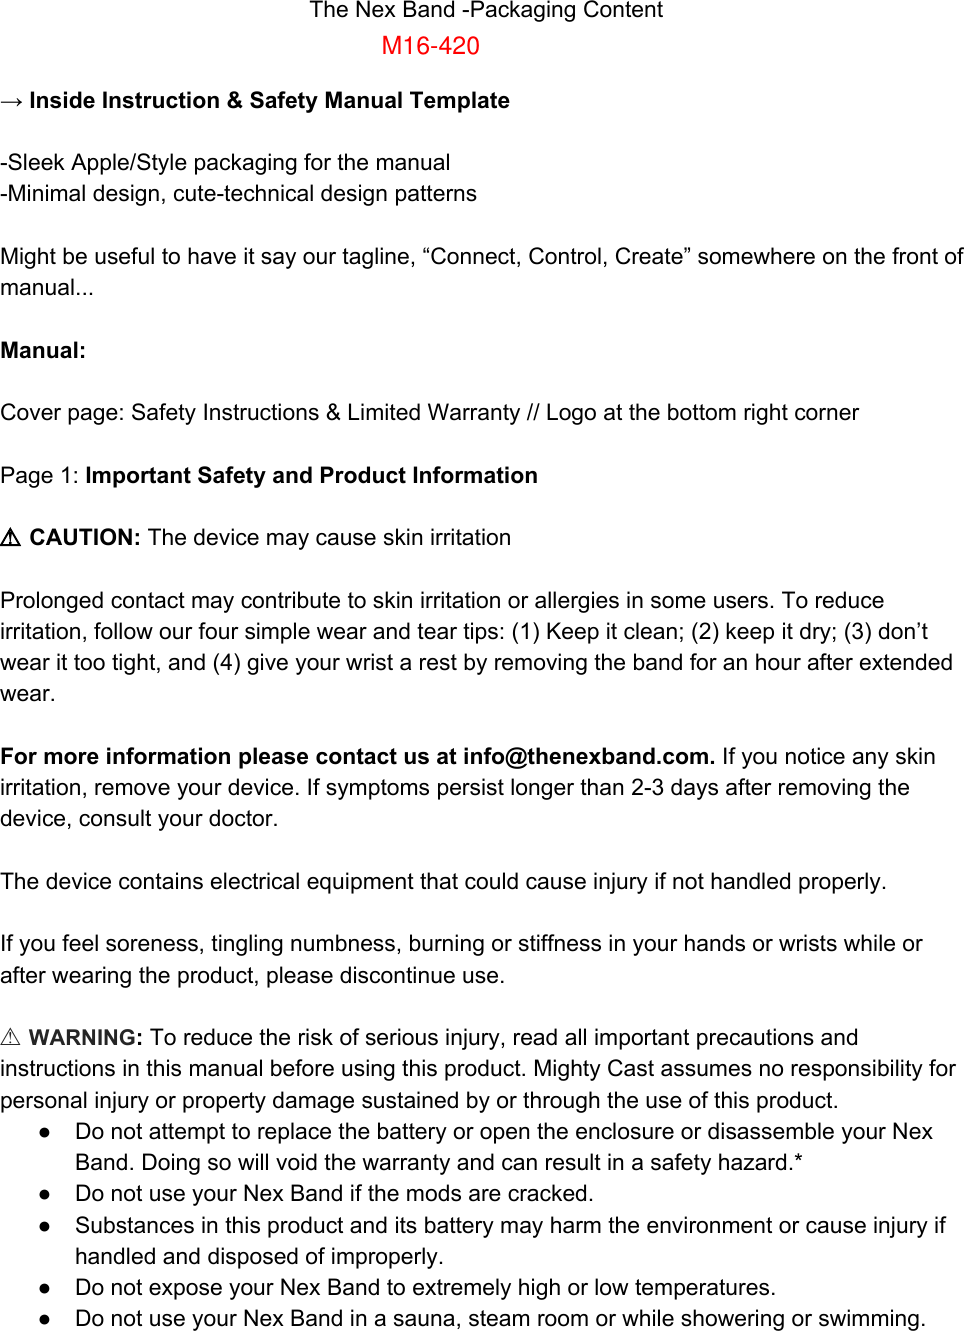 mighty cast 16420nex customizable smart band user manual rh usermanual wiki Organization Guide Guide Book